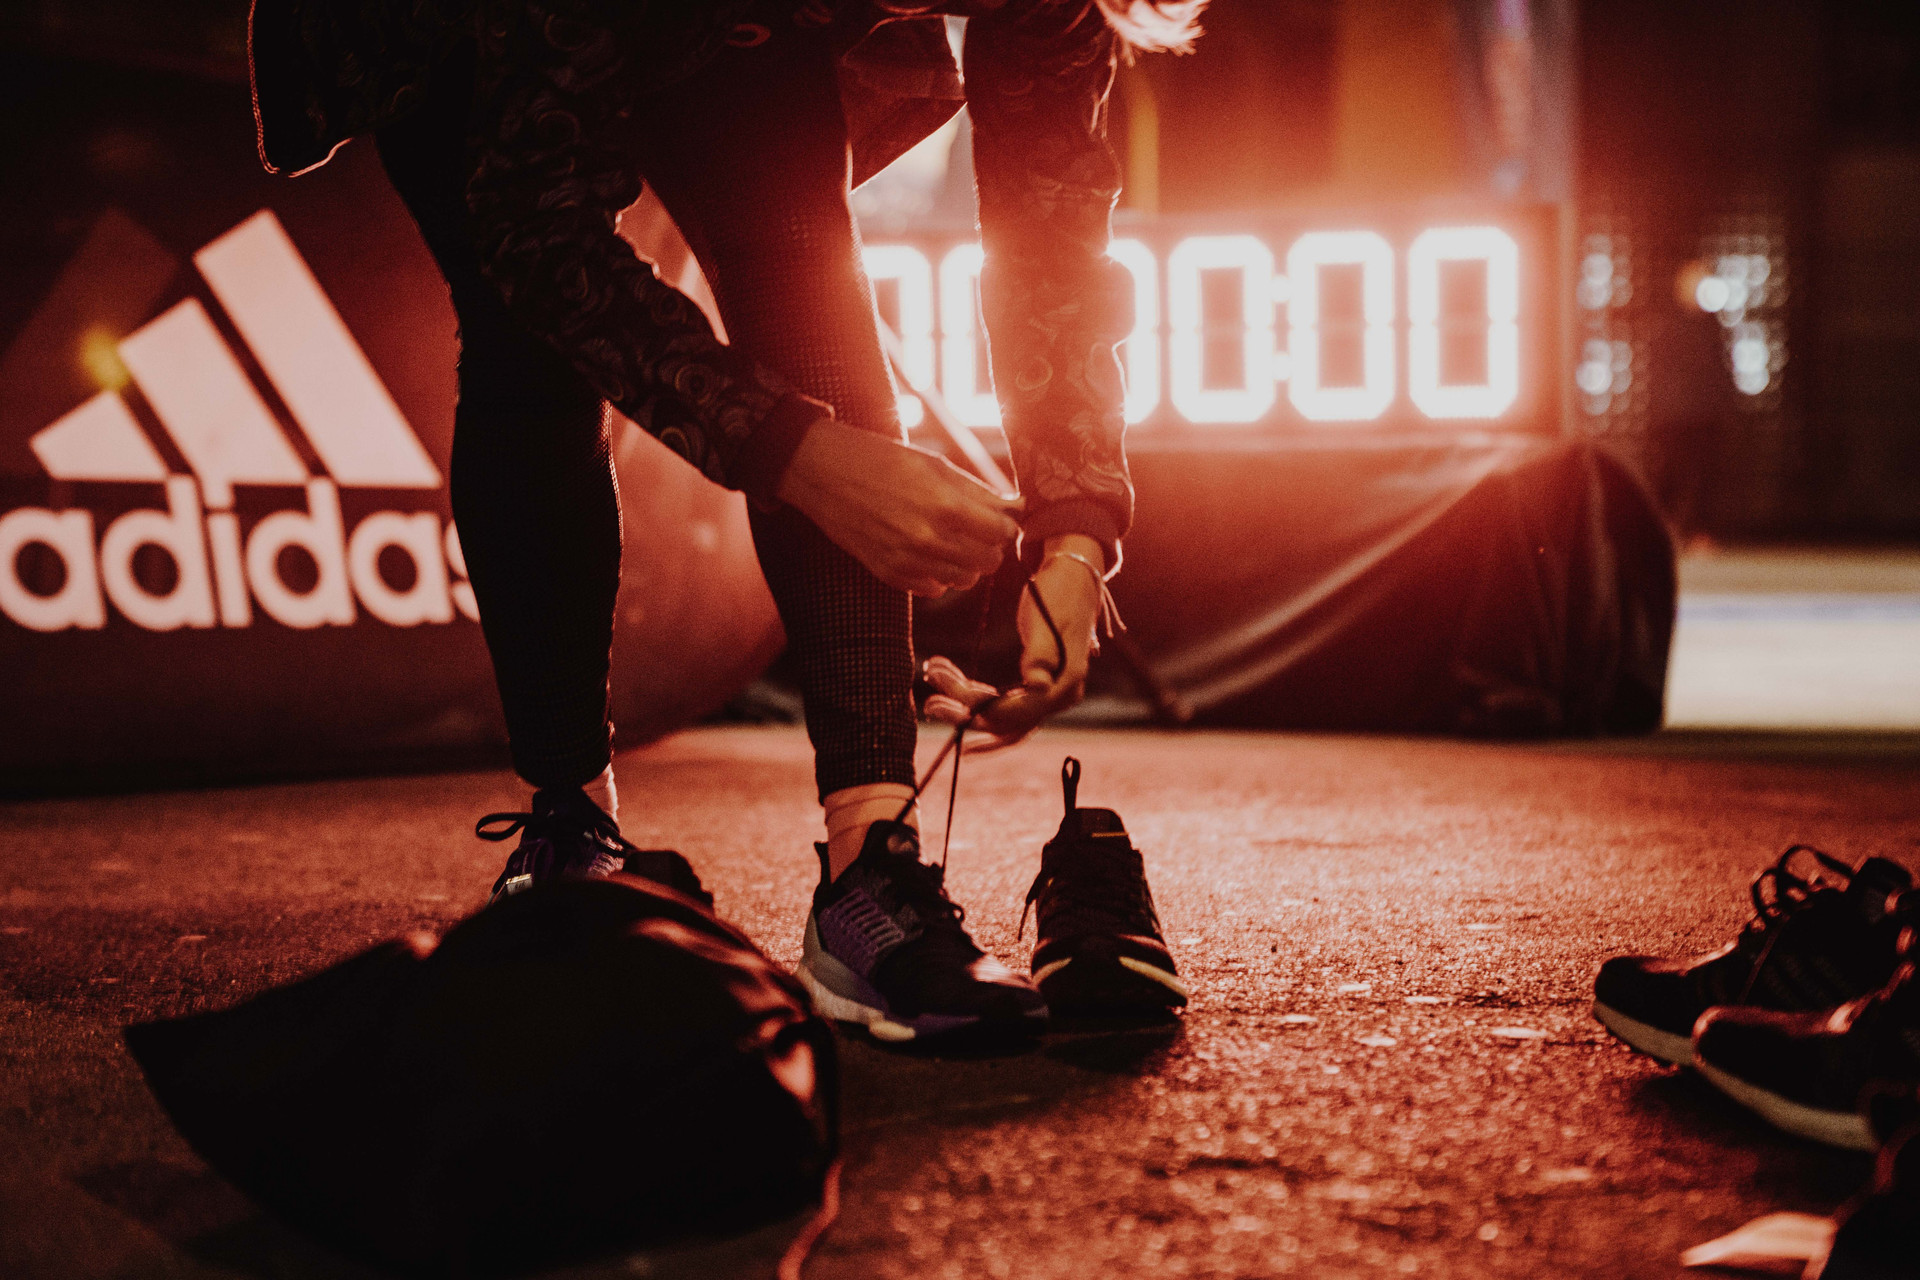 Adidas5KDay2 (15 of 59).jpg